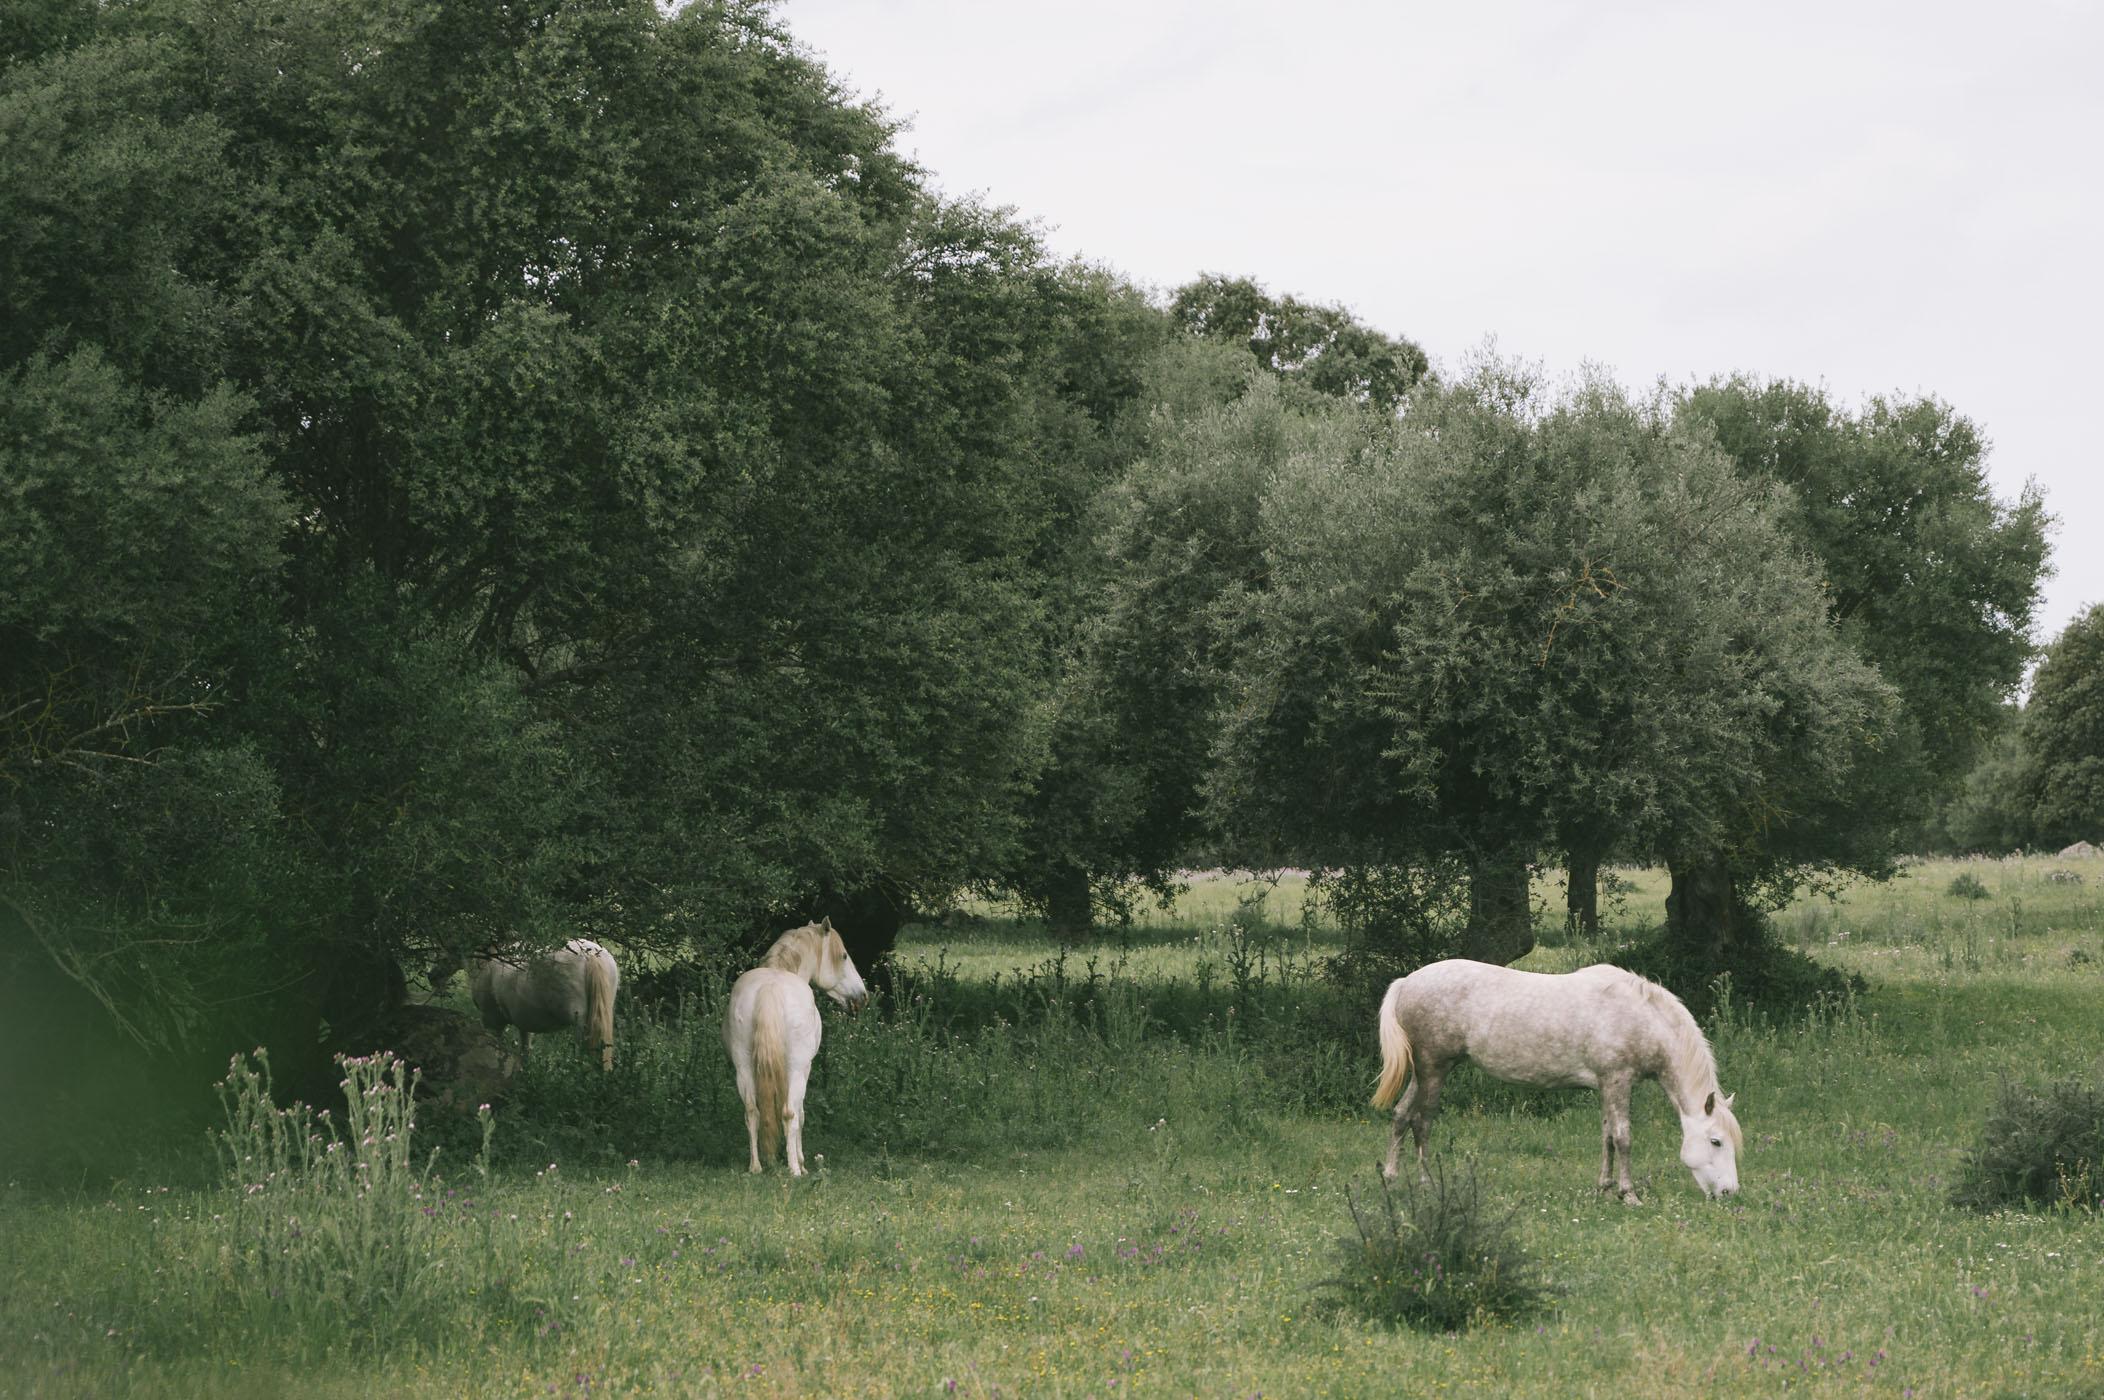 Horses on the estate of São Lourenço do Barrocal in the Alentejo region of Portugal